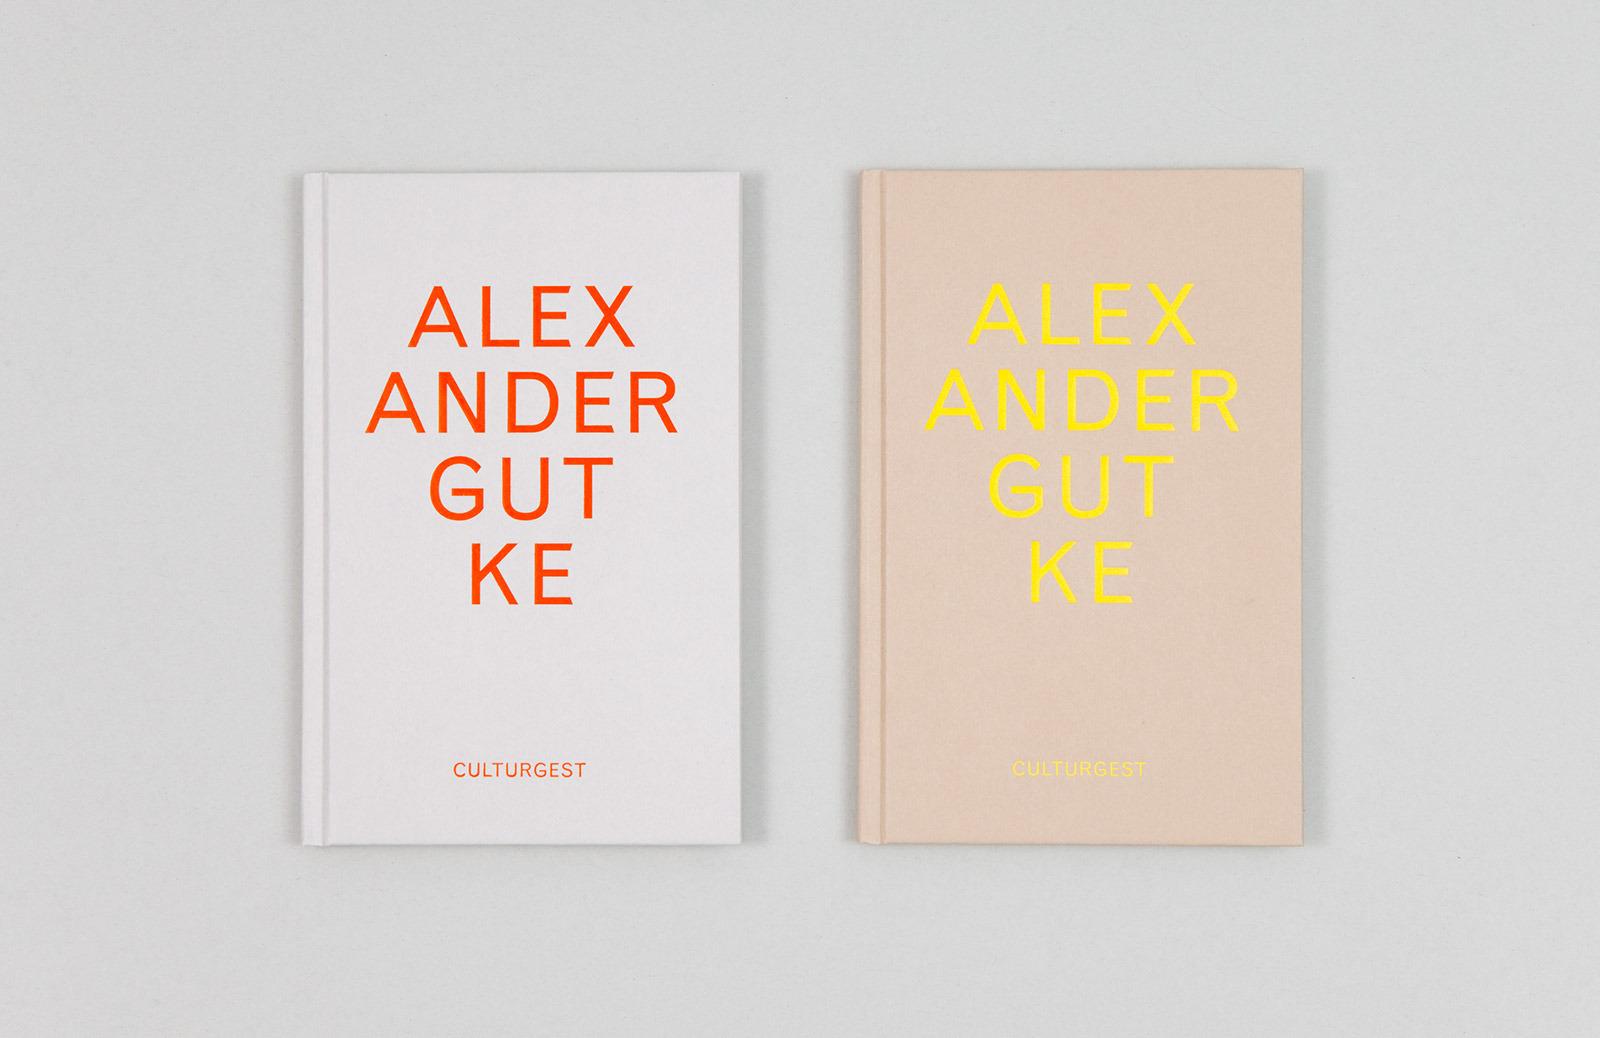 Alexander Gutke — Carvalho Bernau